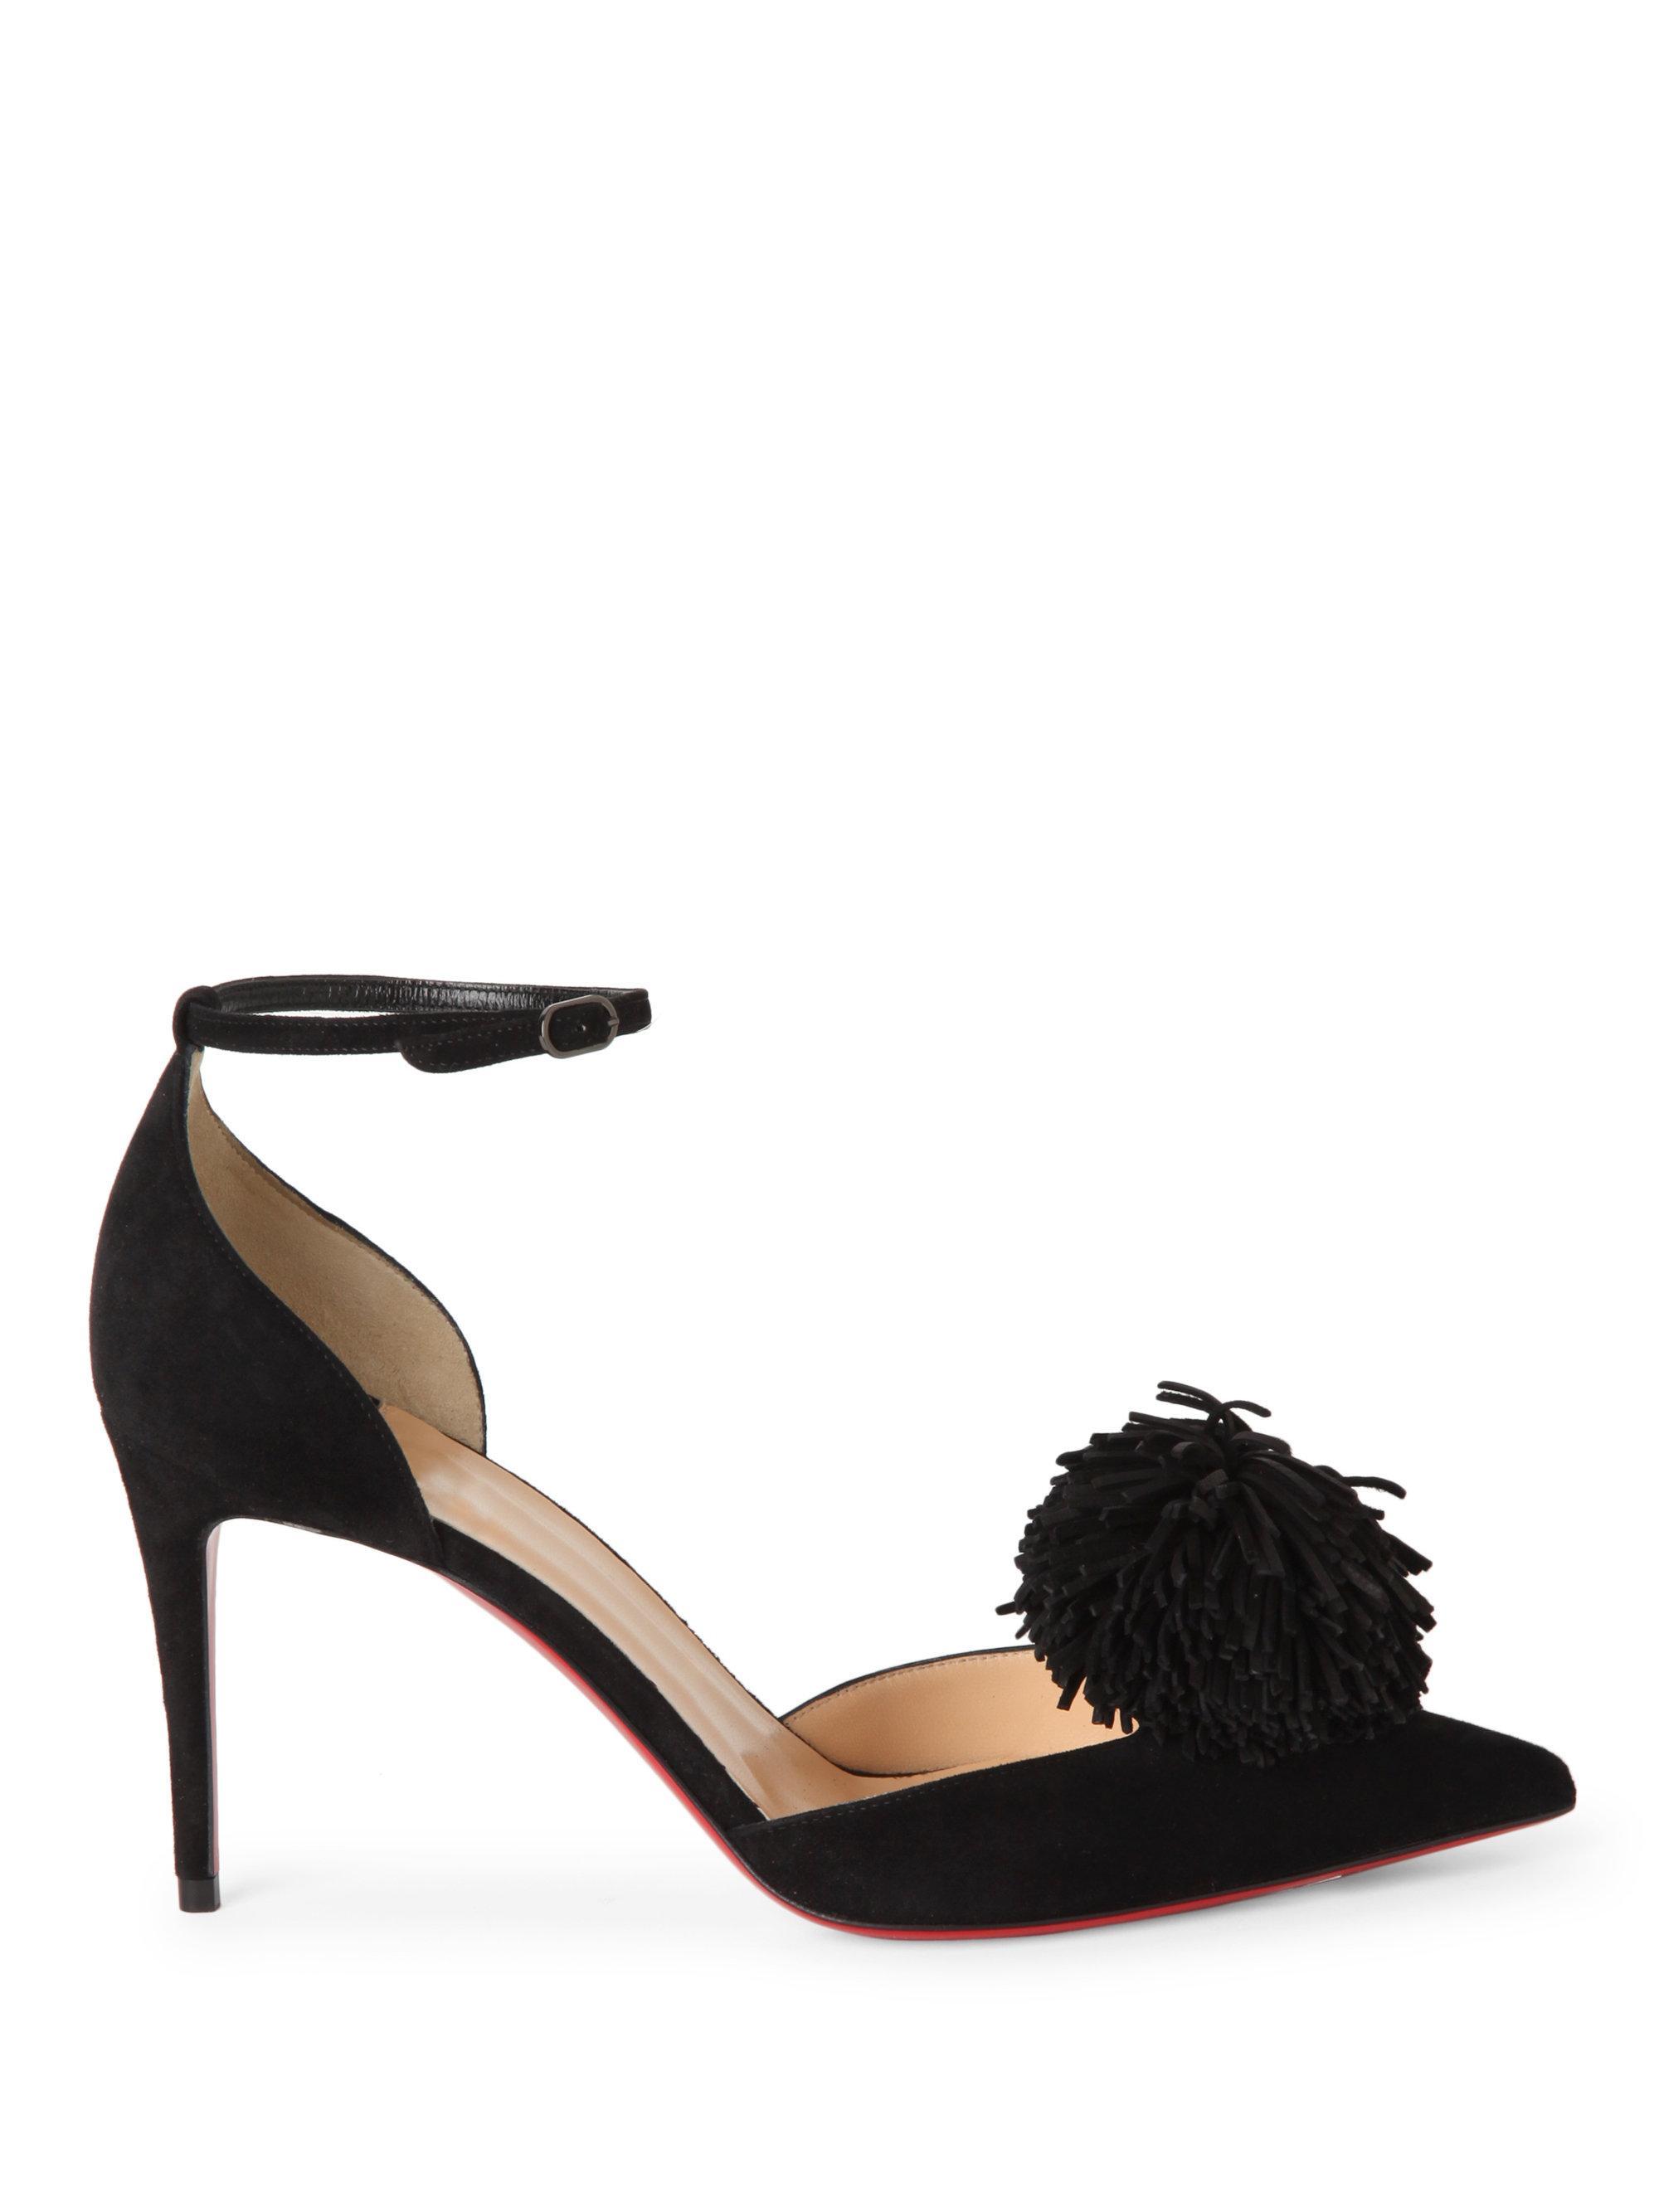 ddf36831fc1 Christian Louboutin Black Tsarou 100 Suede D'orsay Ankle-strap Pumps